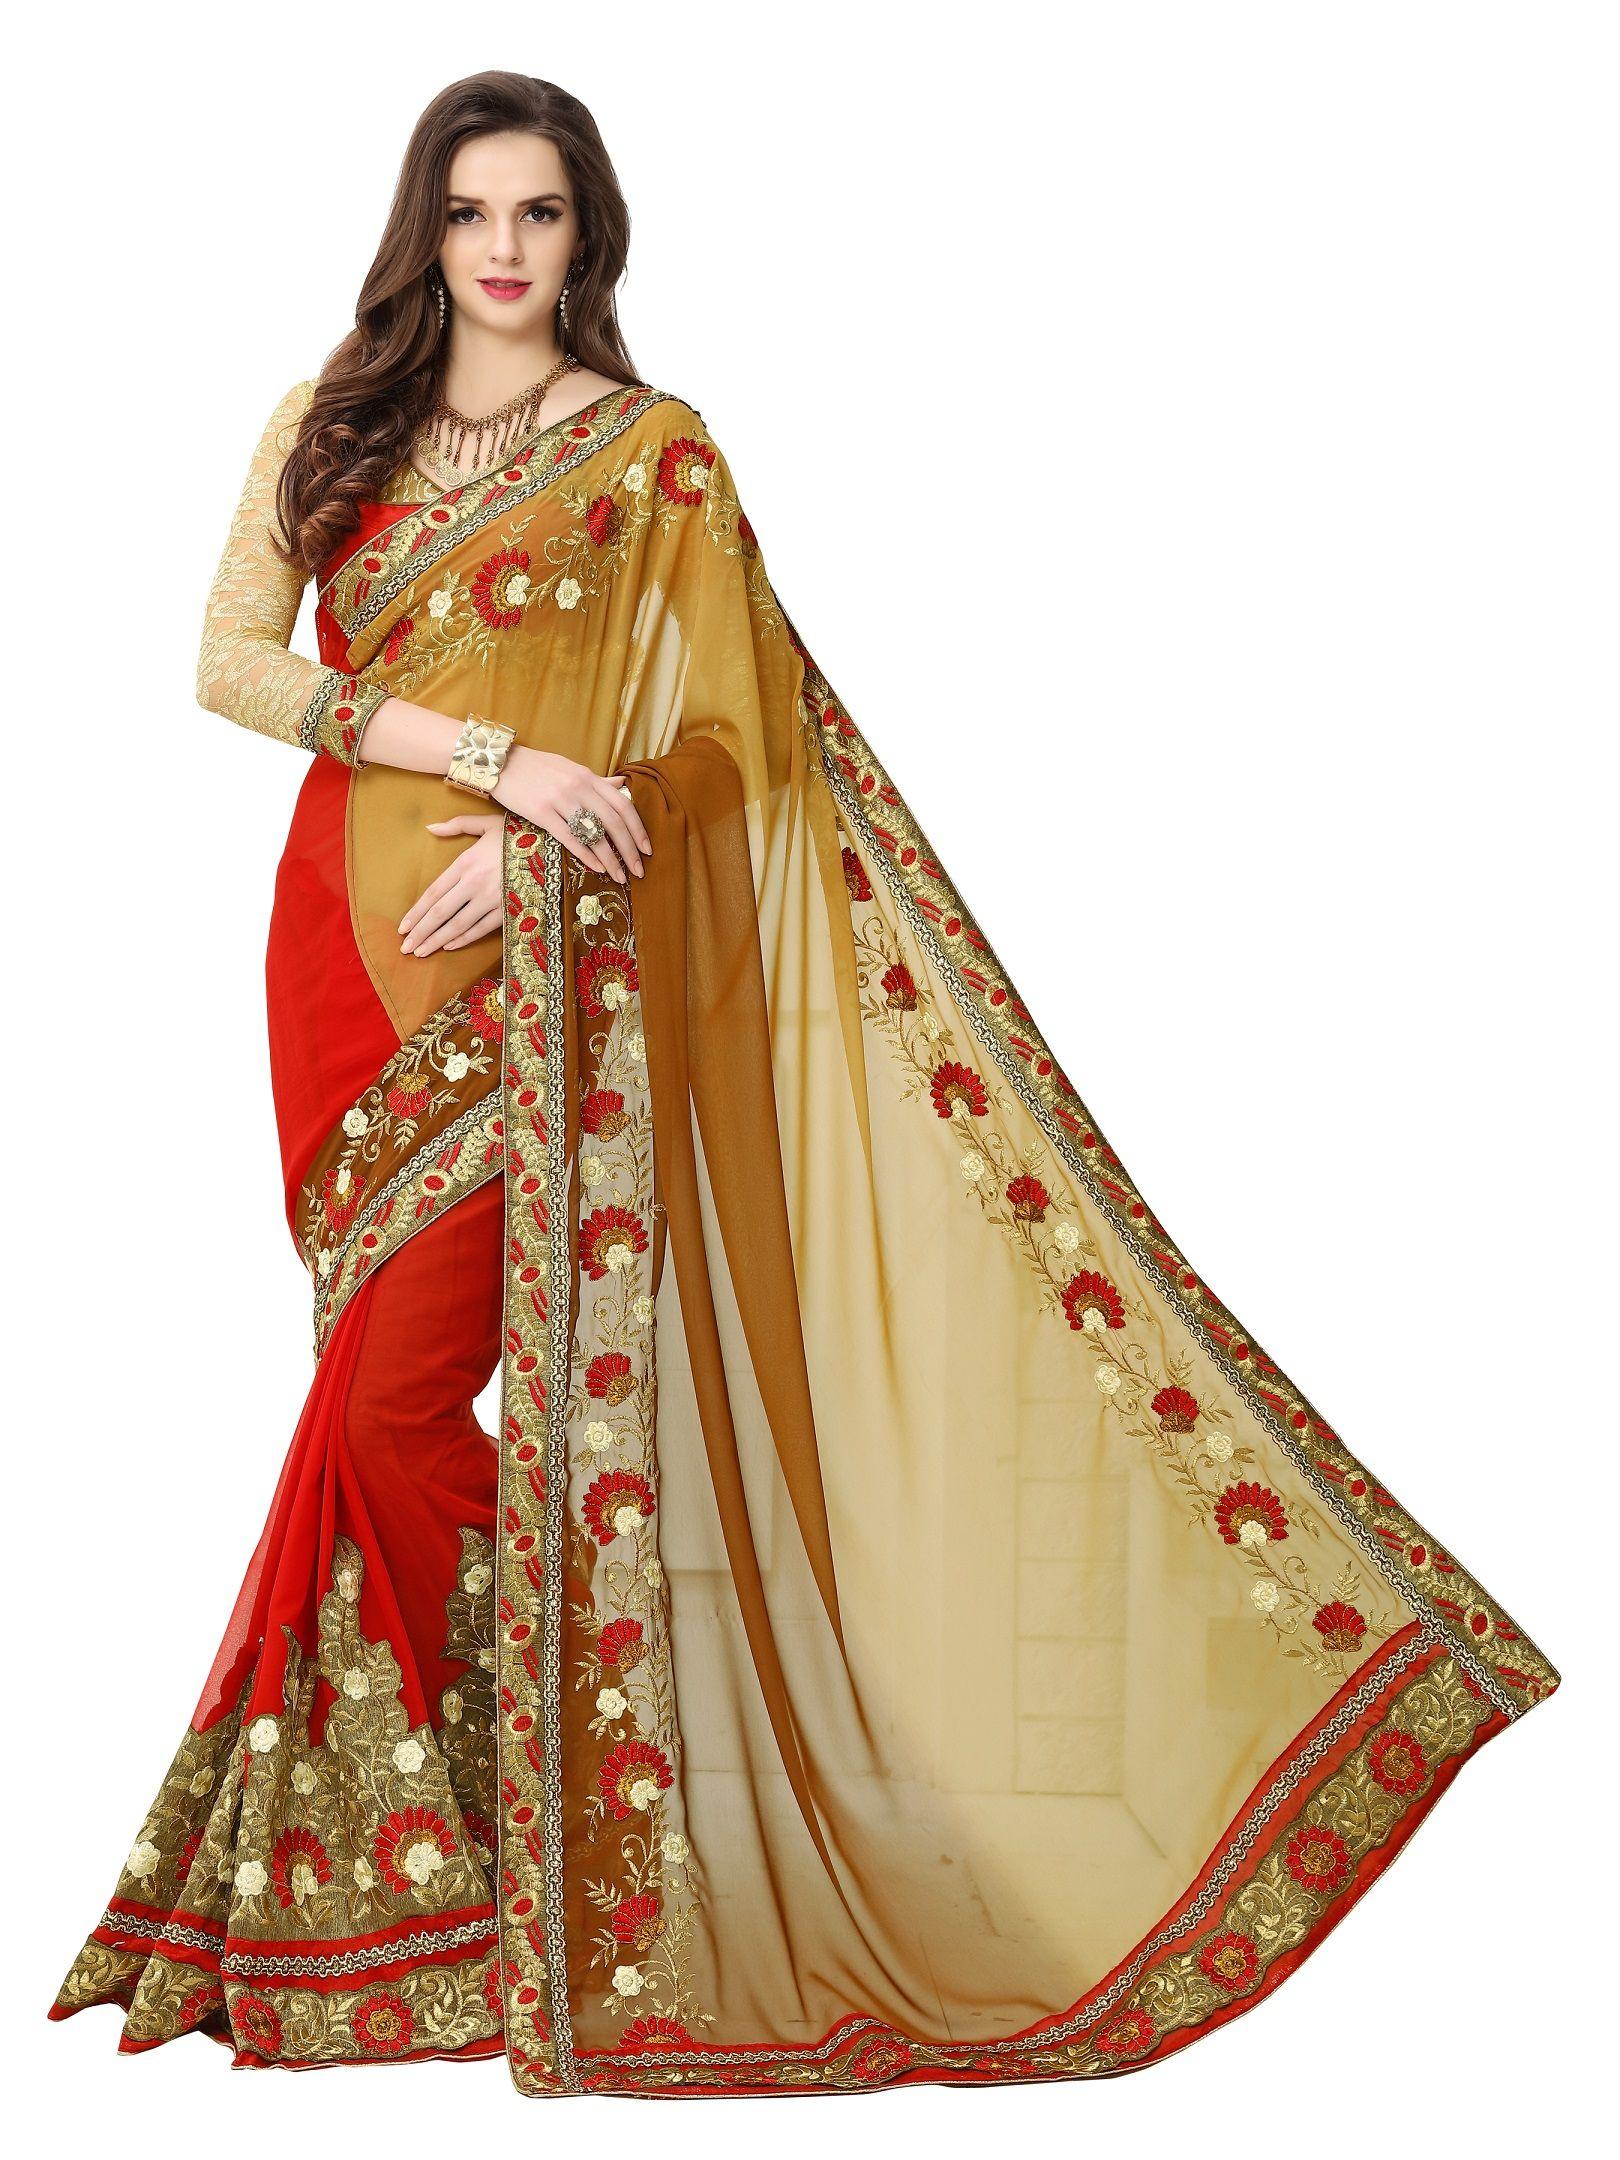 904ab7d2bb Designer Heavy Double Color Hand Work Saree, 7 Days Easy Return, Buy Designer  Saree, Georgette Saree, Embroidery Saree, Party Wear Saree, etc.